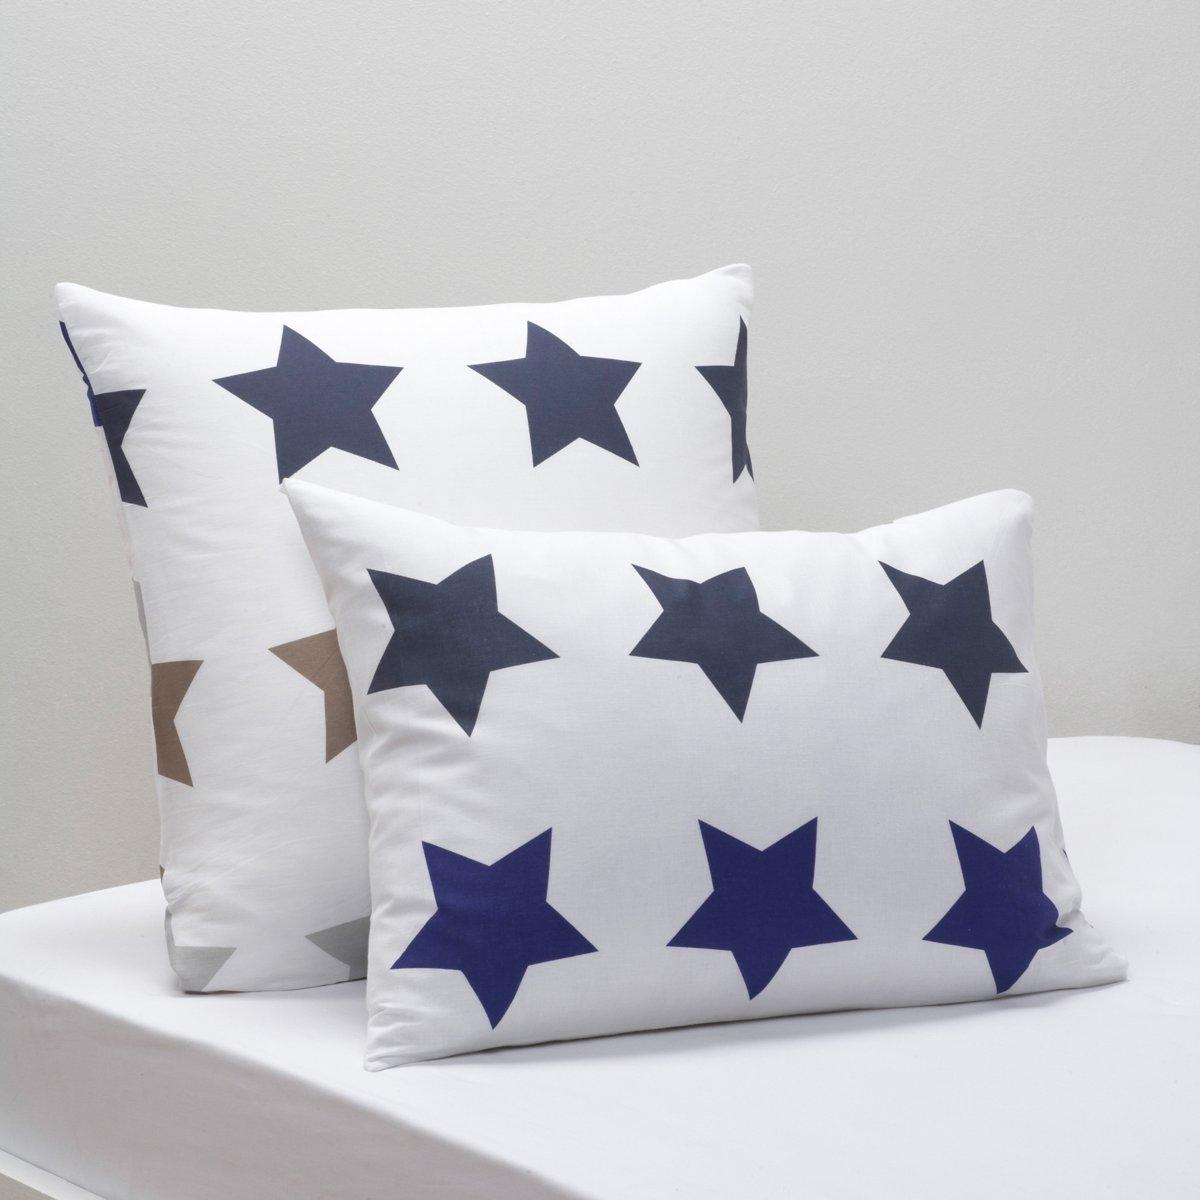 Наволочка Звезды